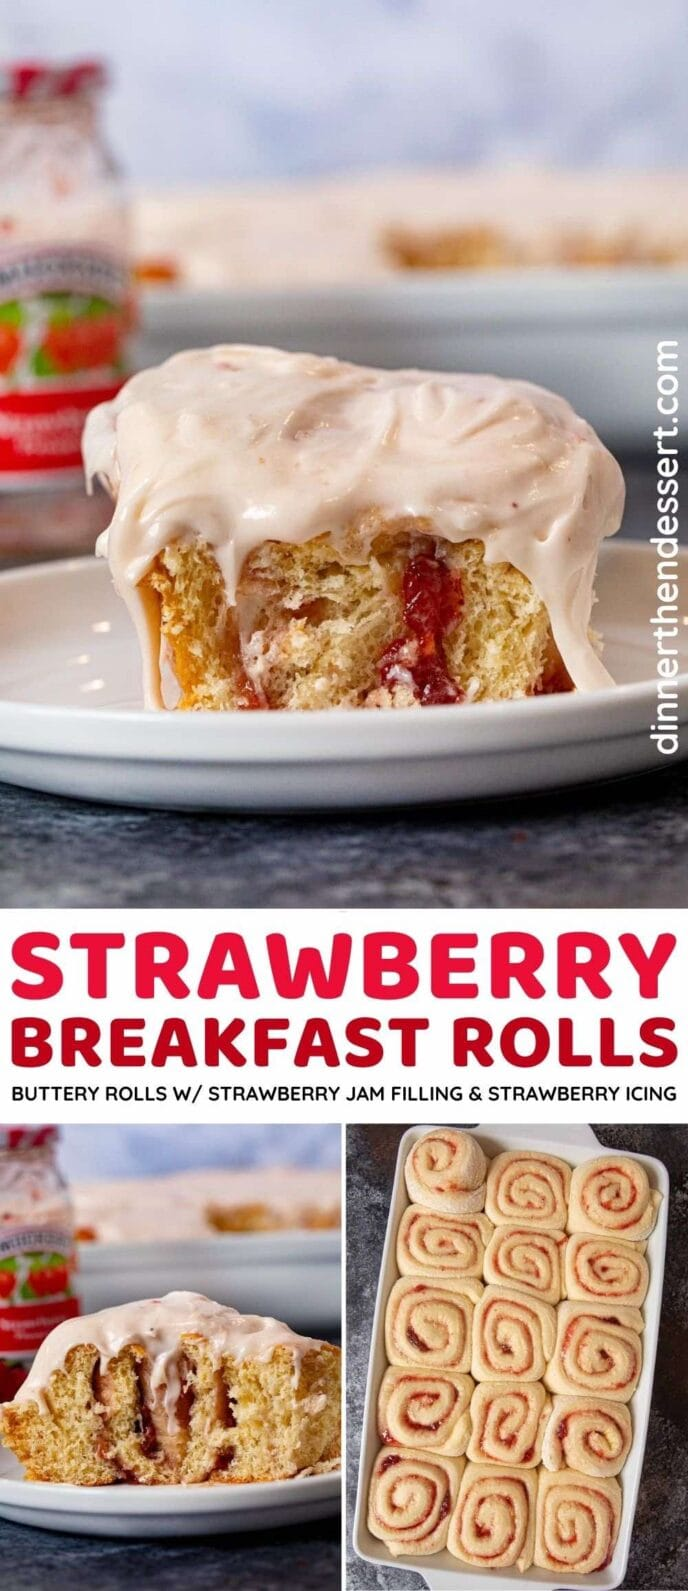 Strawberry Breakfast Rolls collage